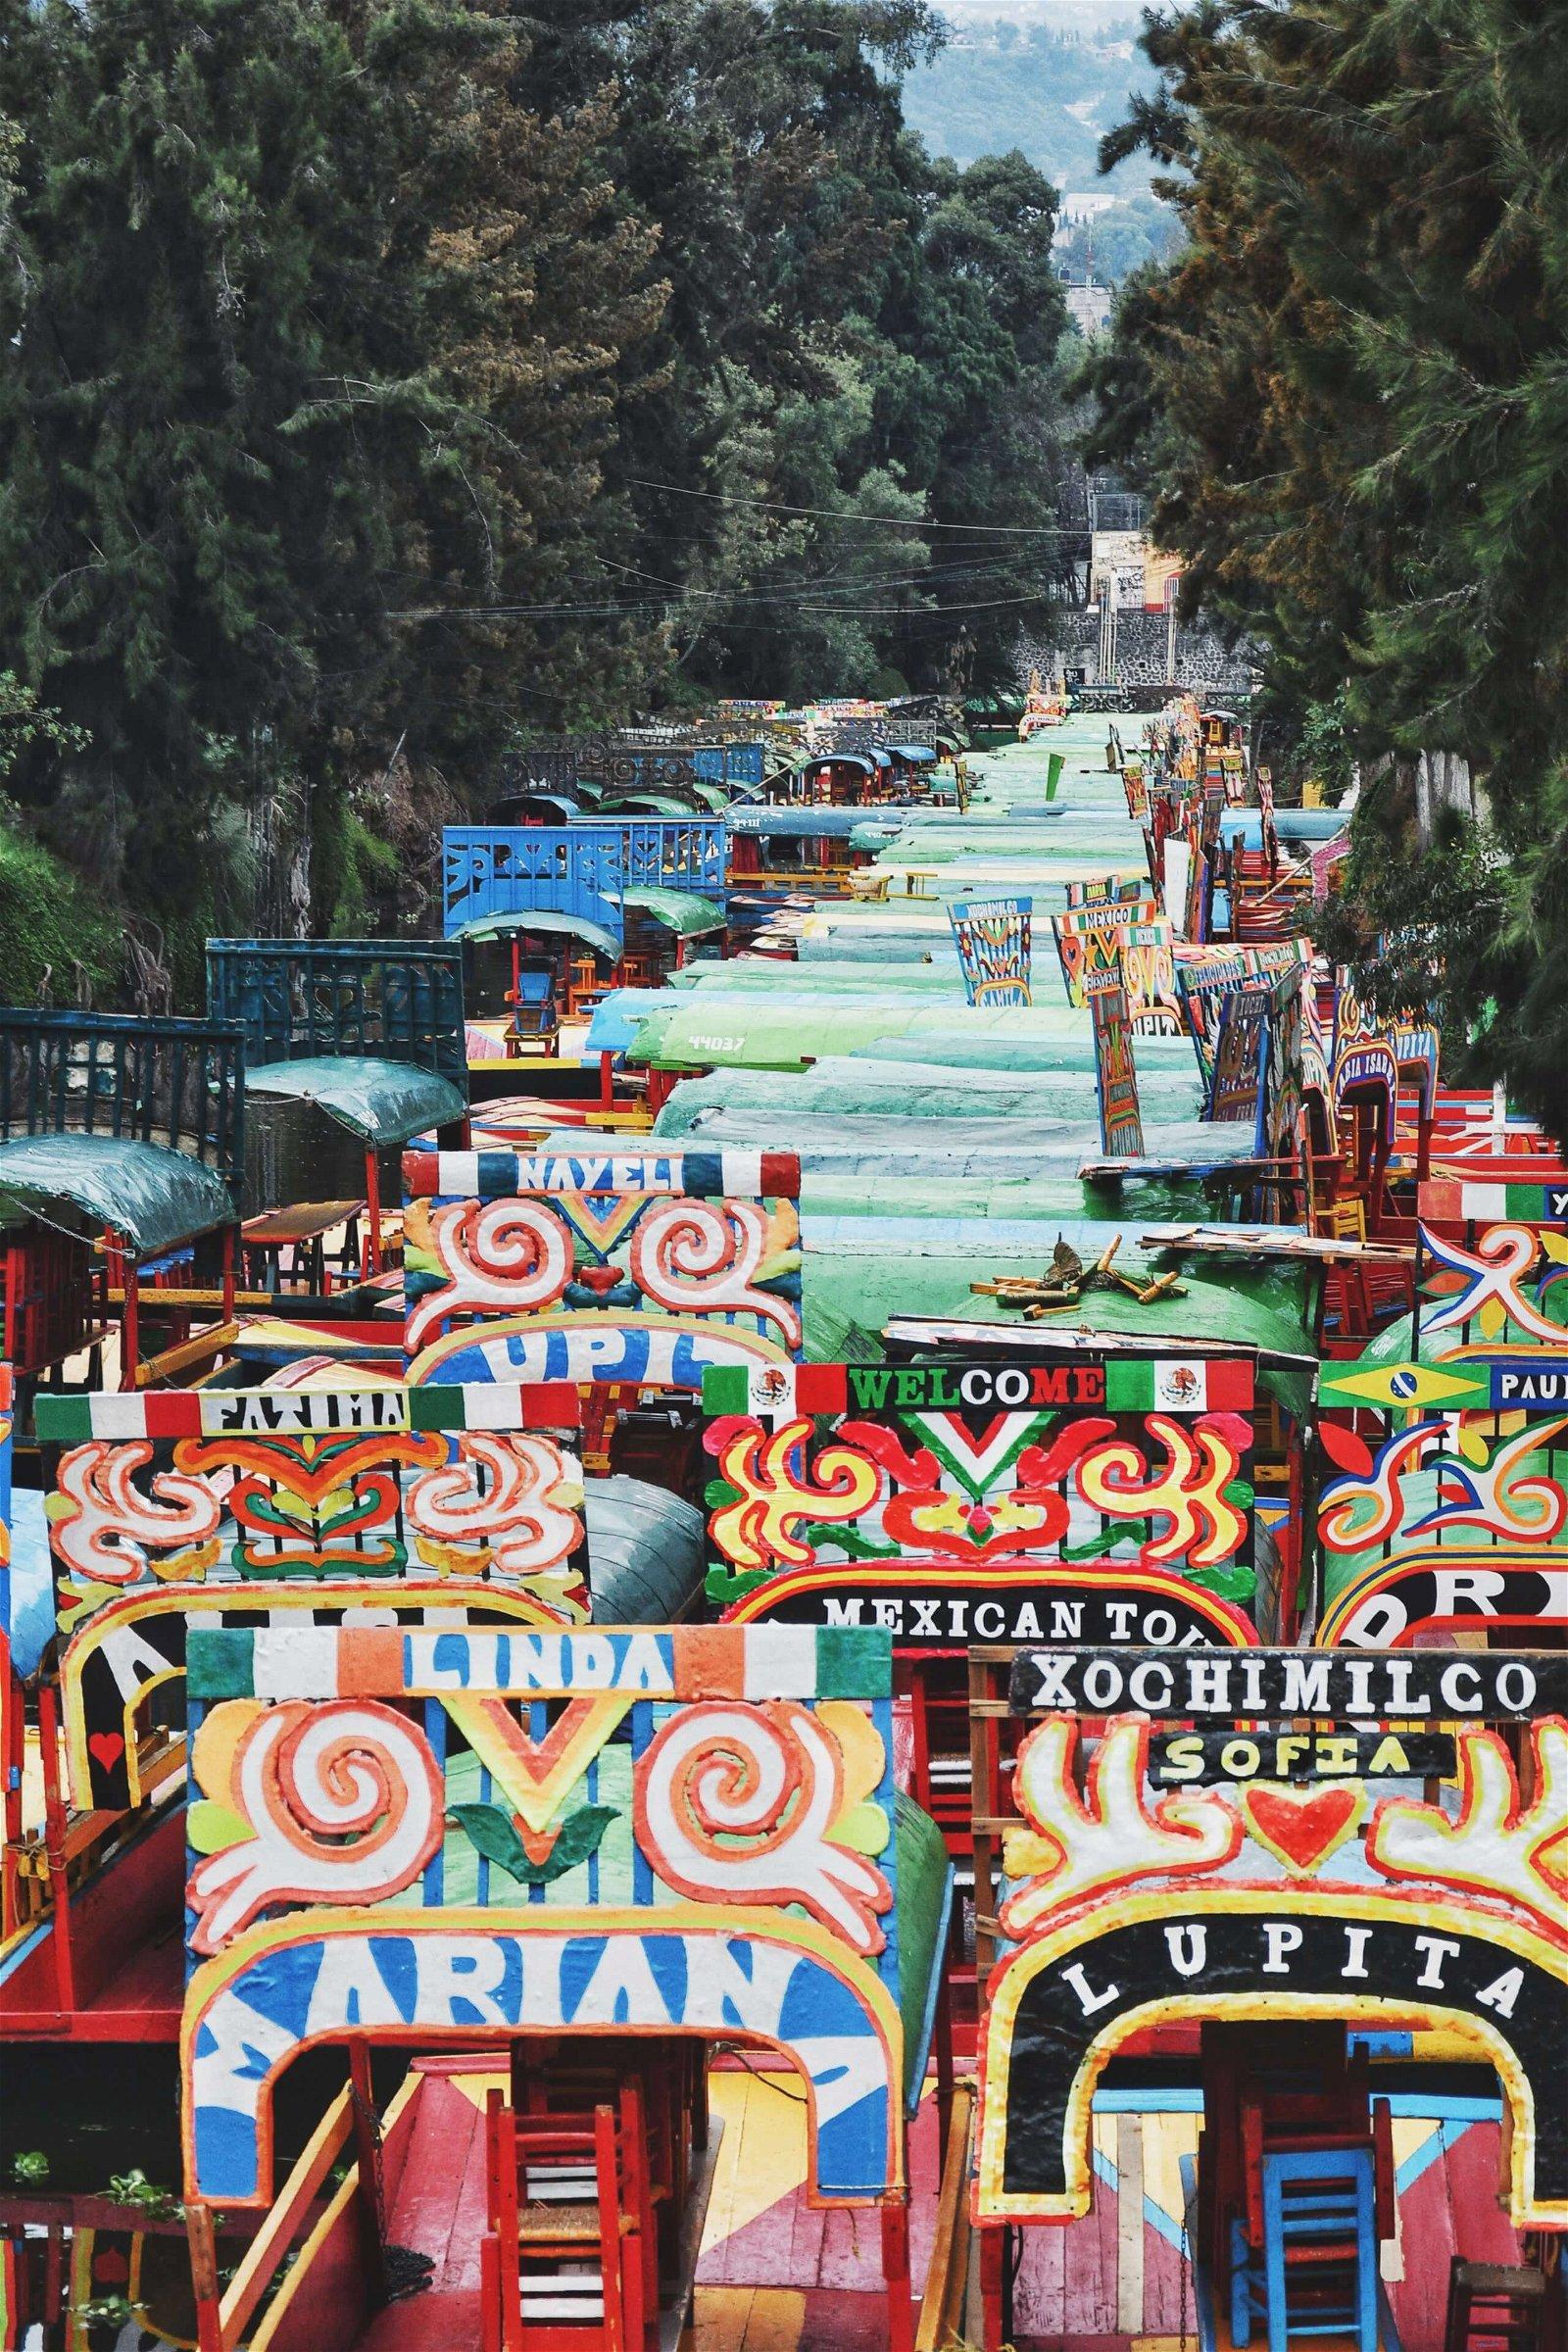 Mexico City: Fashion, Art & Culture